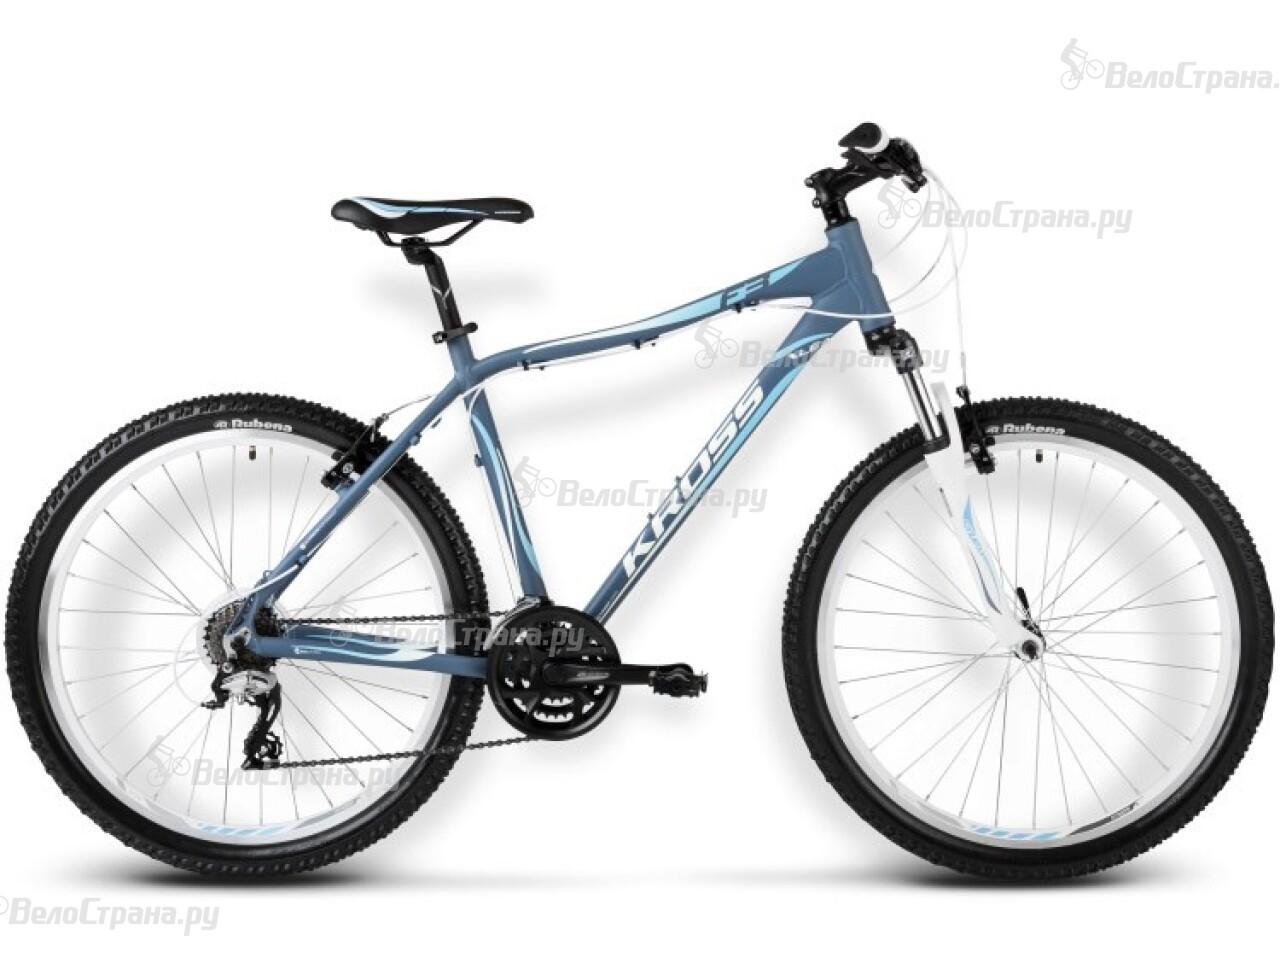 Велосипед Kross Lea F3 (2015) велосипед kross flex 3 0 2015